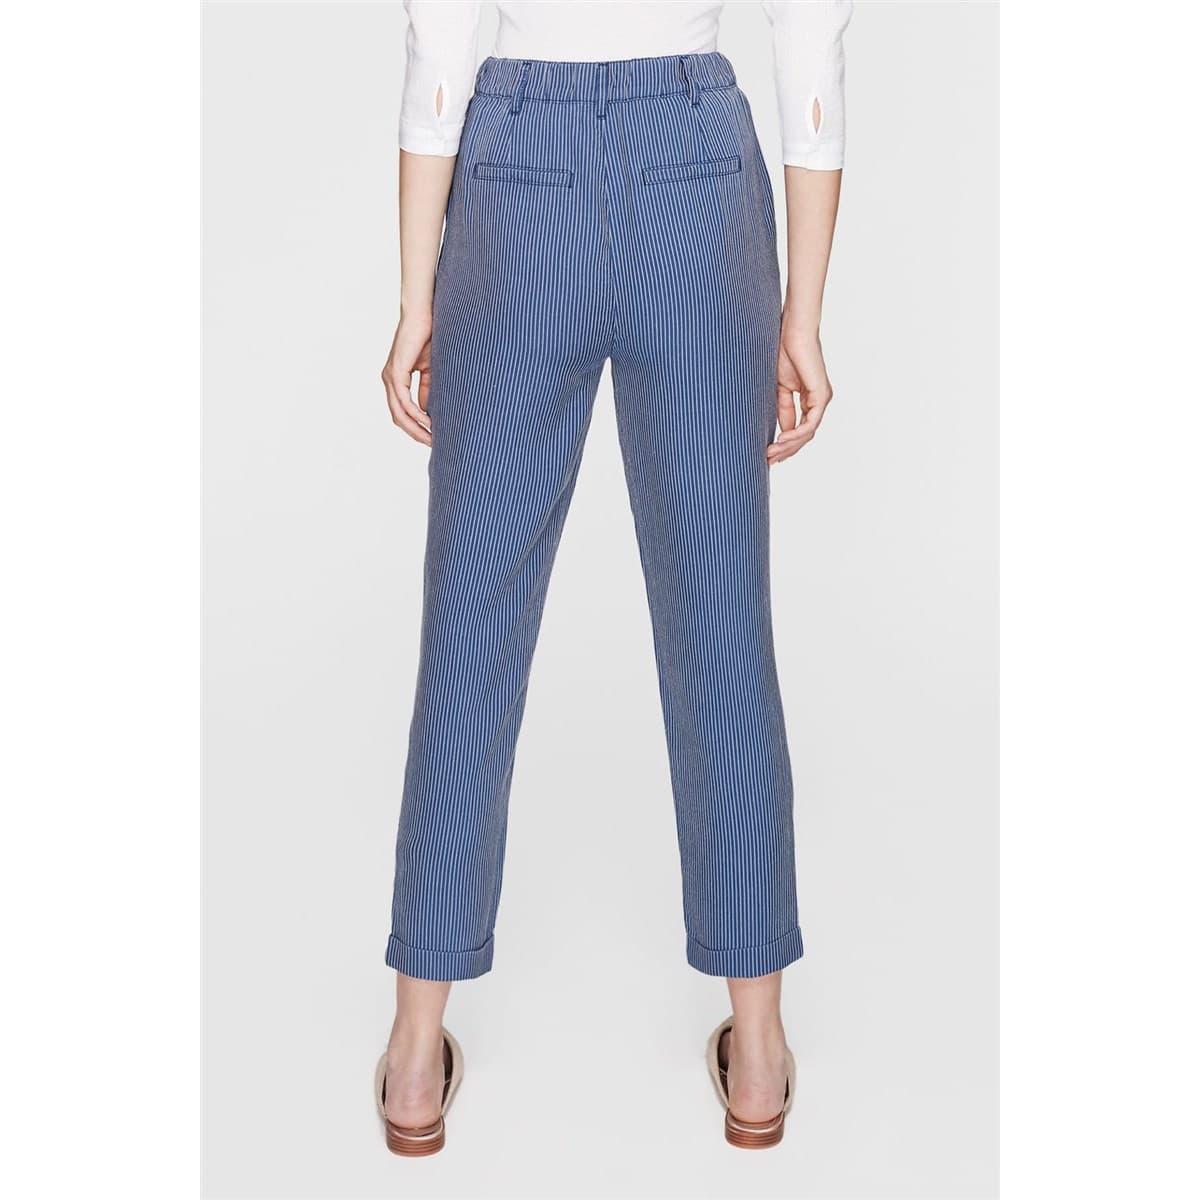 Kadın Çizgili İndigo Mavi Pantolon